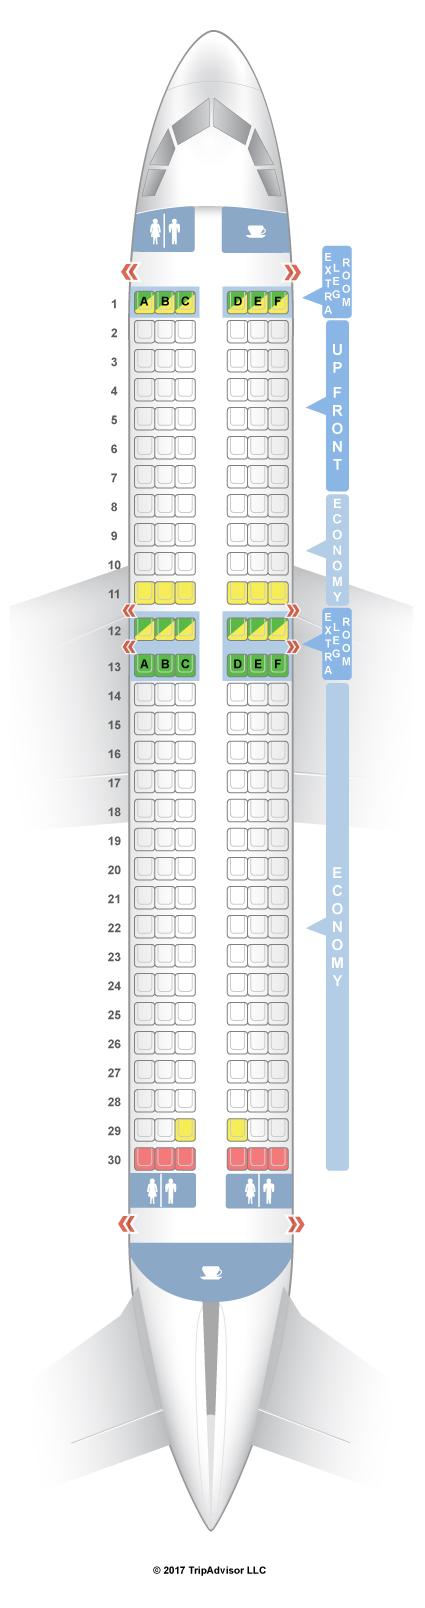 Seatguru Seat Map Tigerair Australia Airbus A320 320